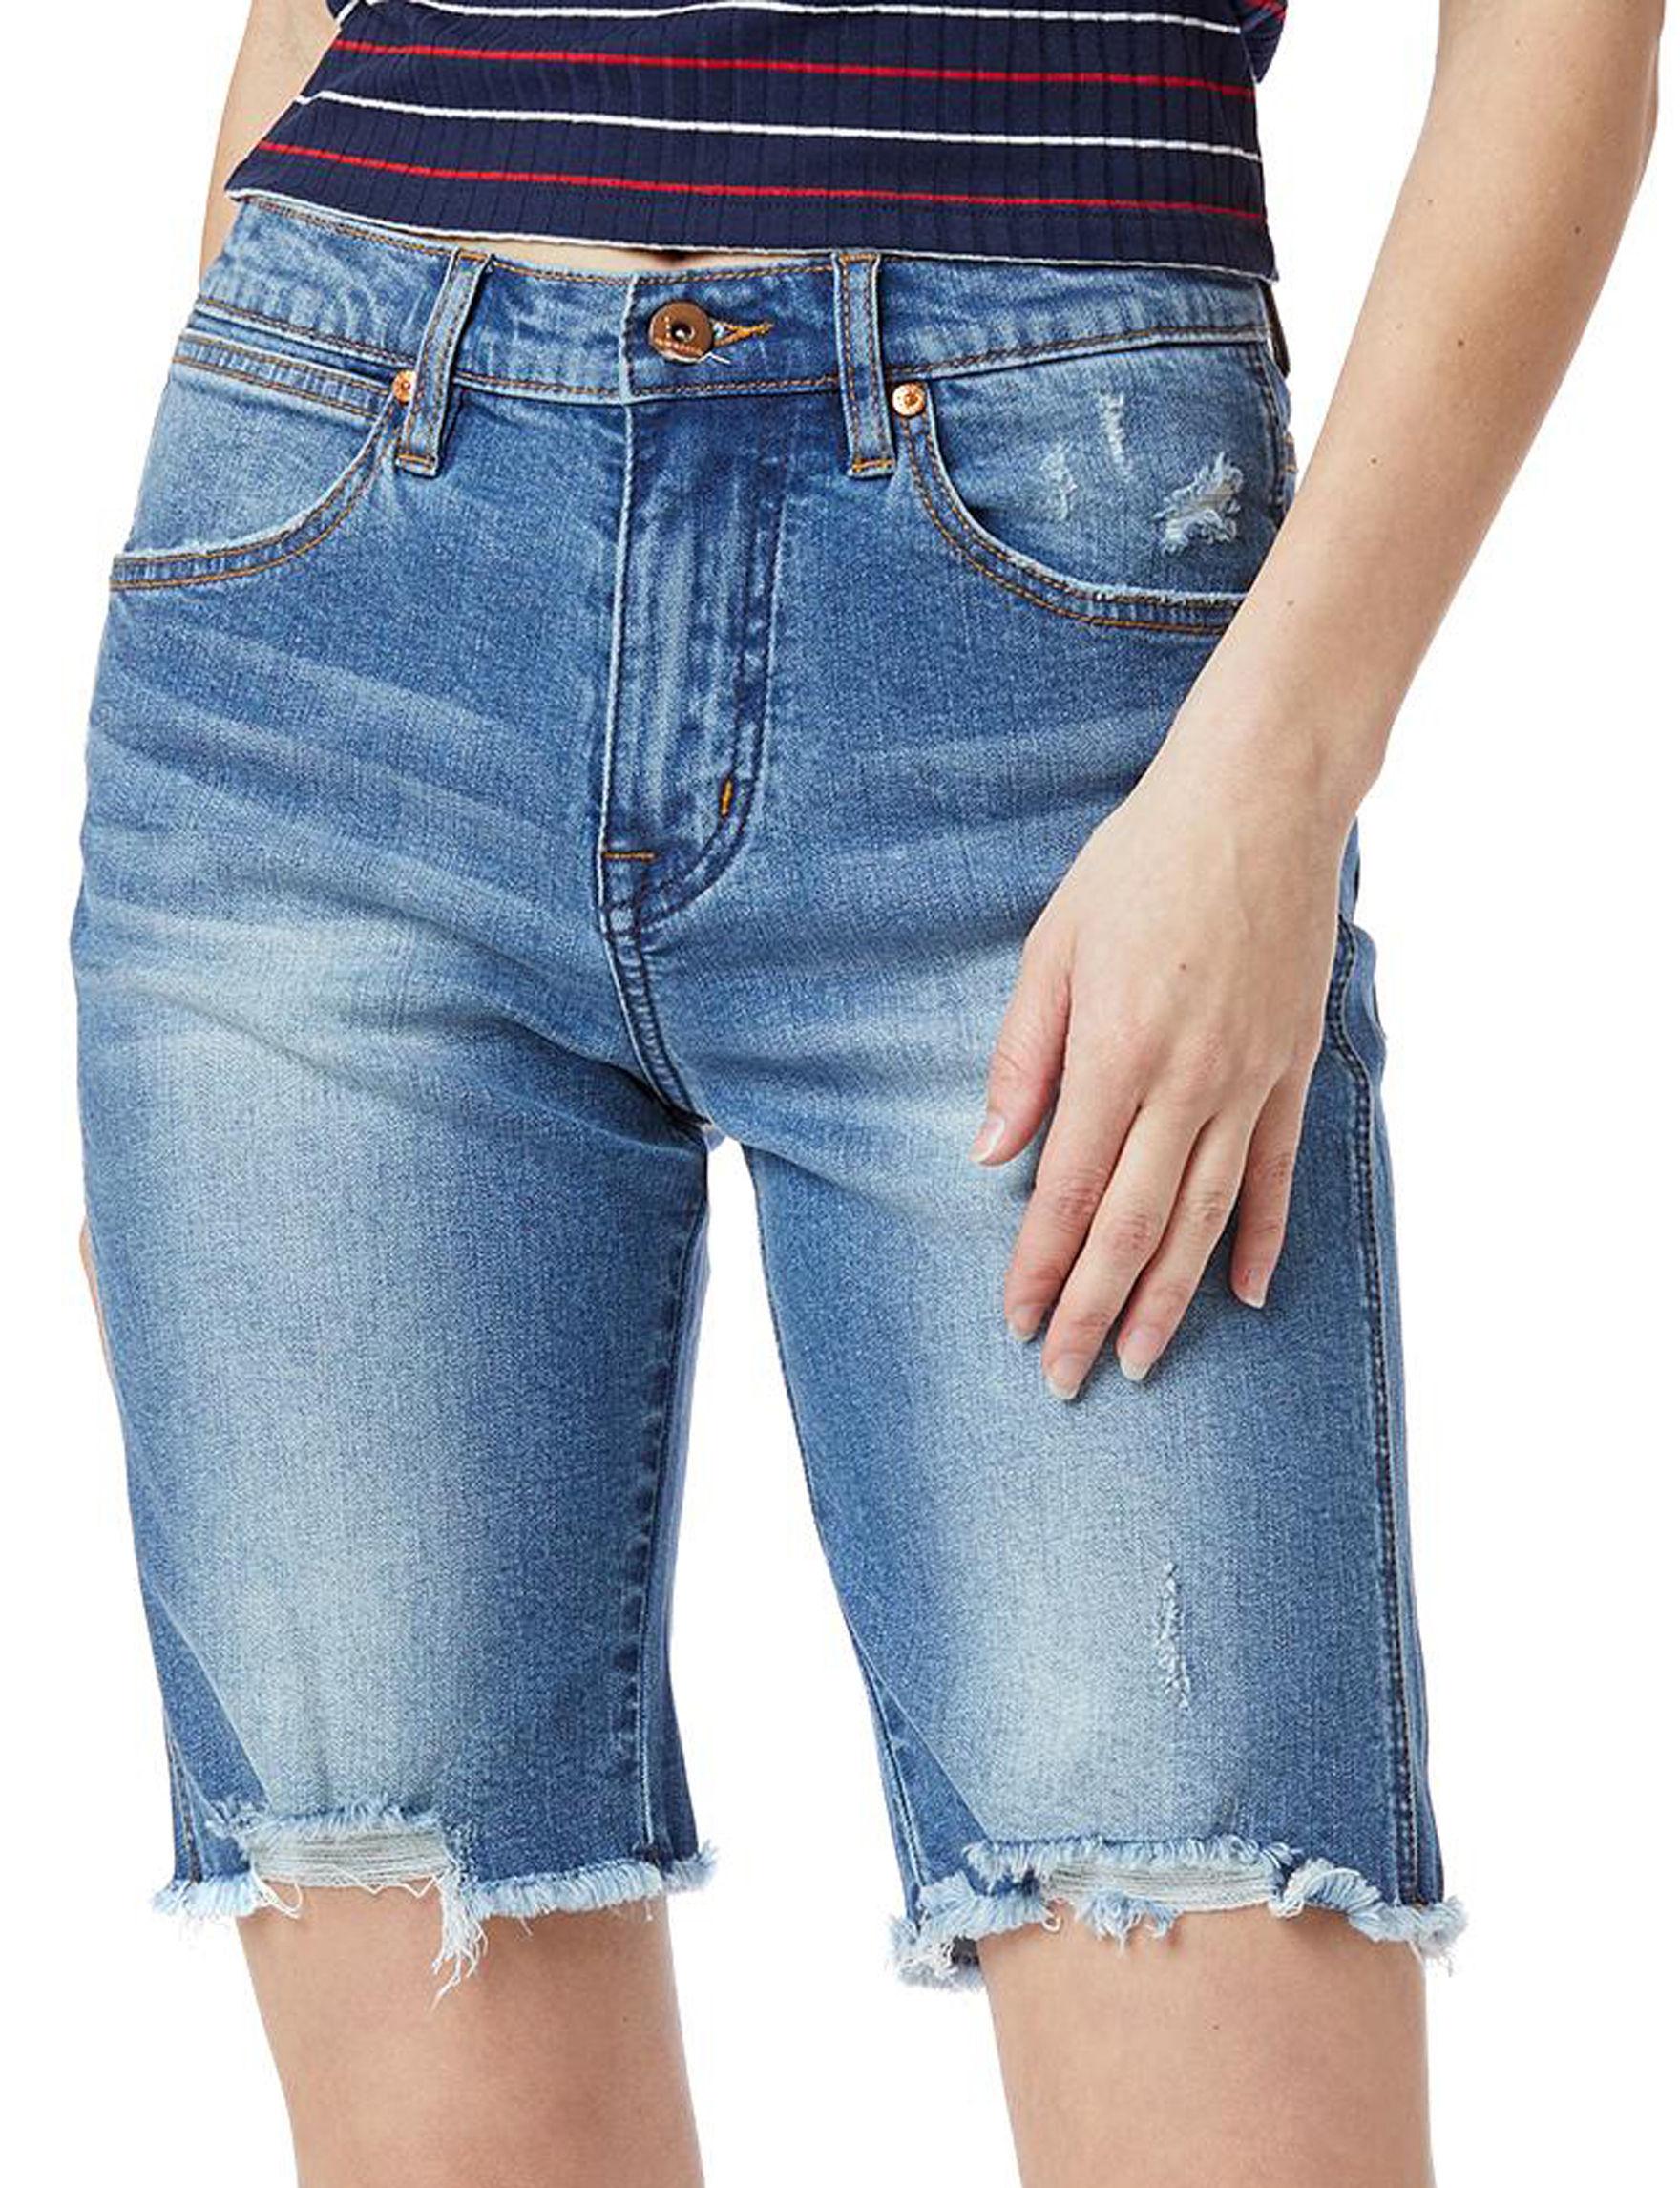 Unionbay Blue Bermudas Denim Shorts